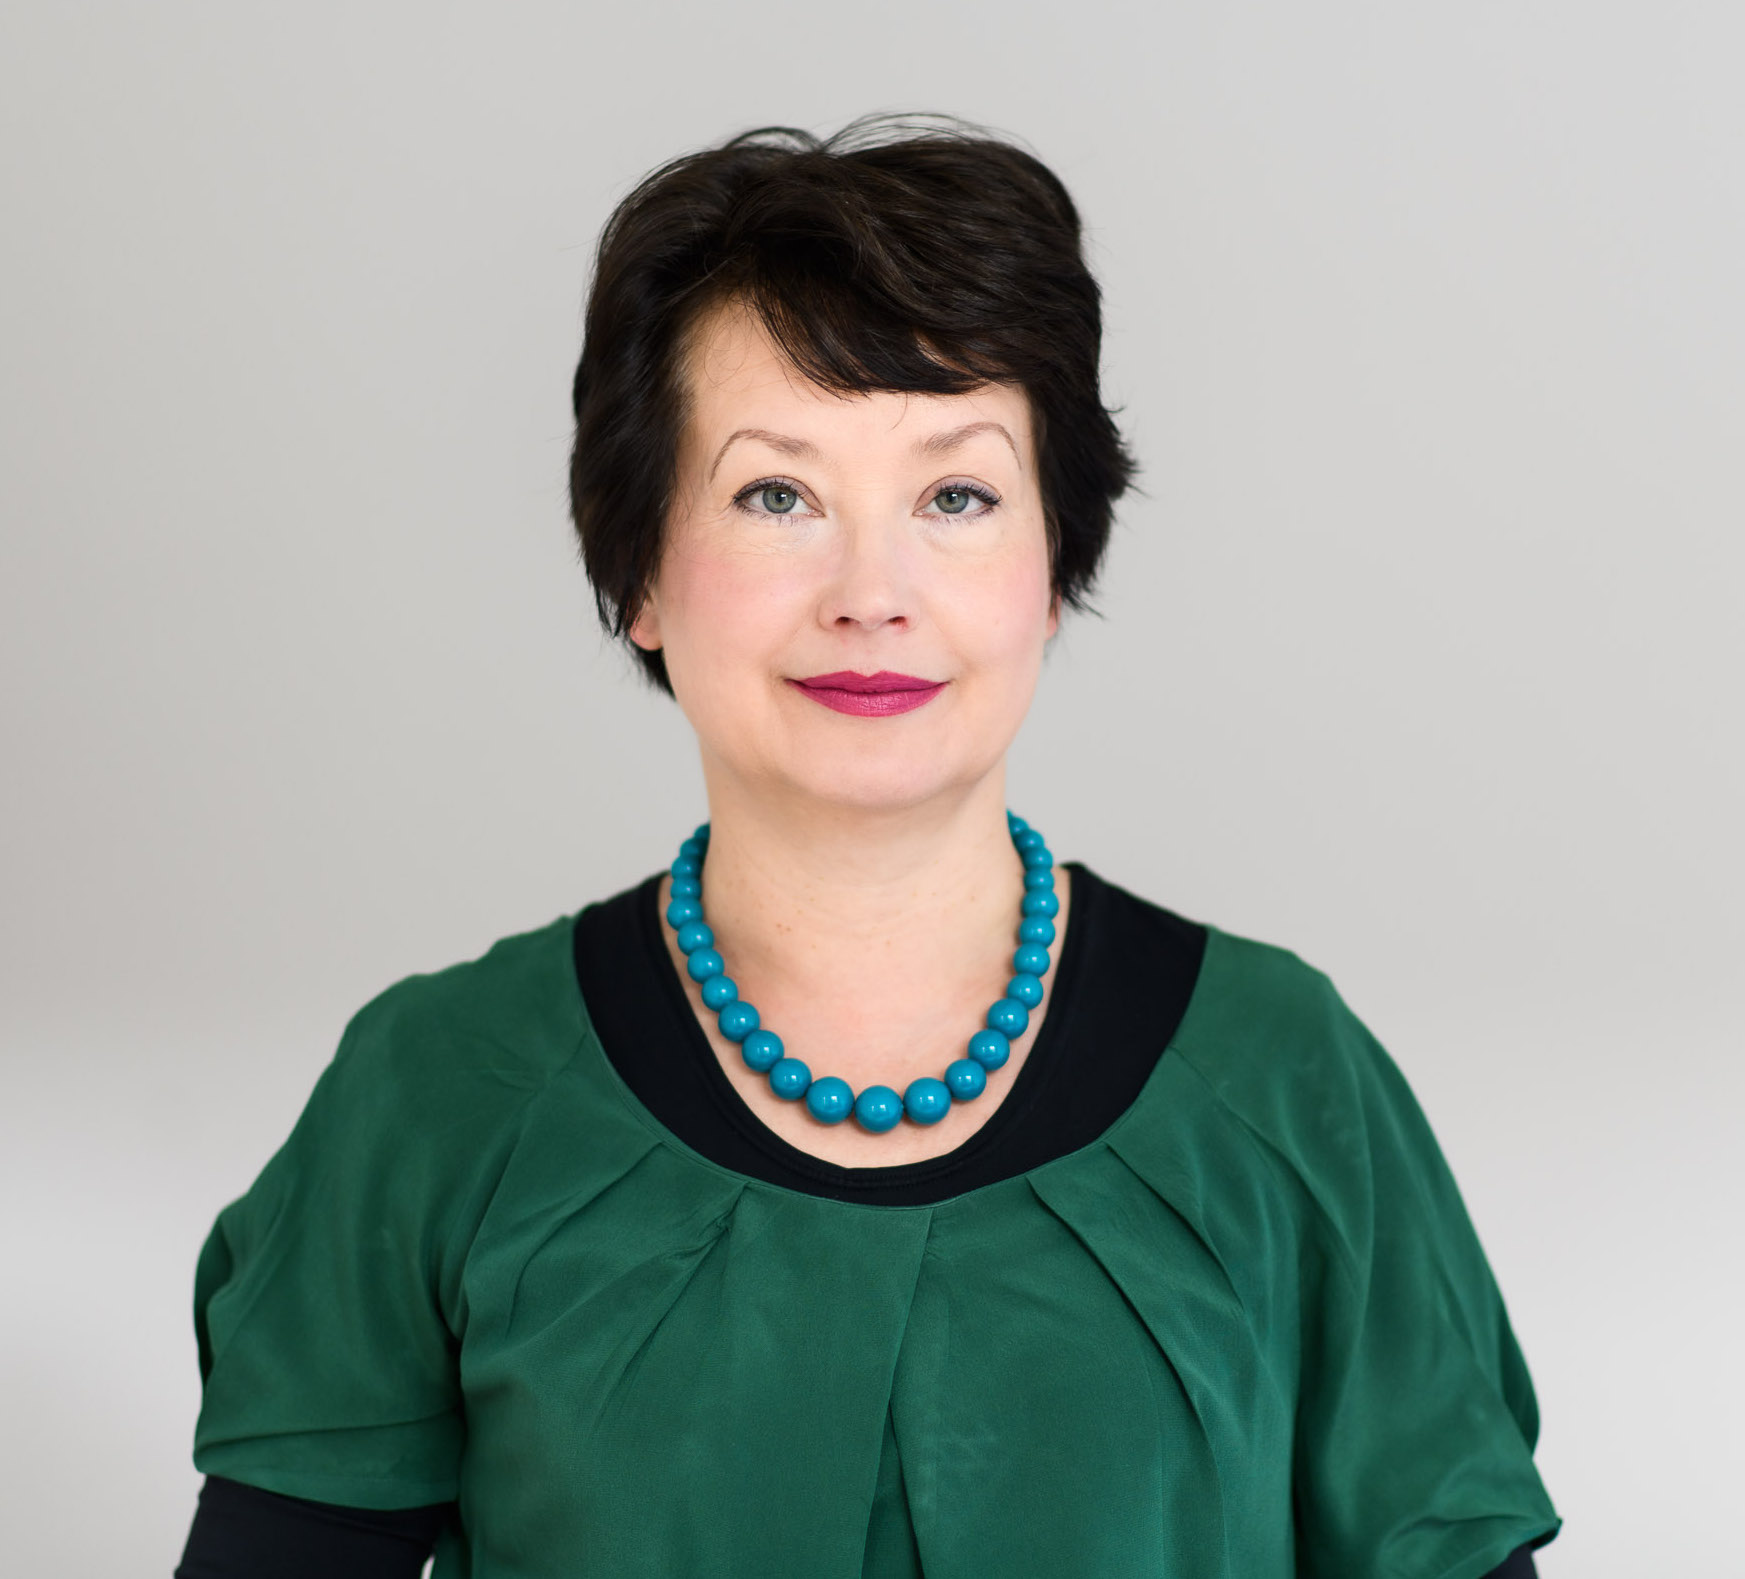 Astrid Windfuhr, Koeln, 2020.